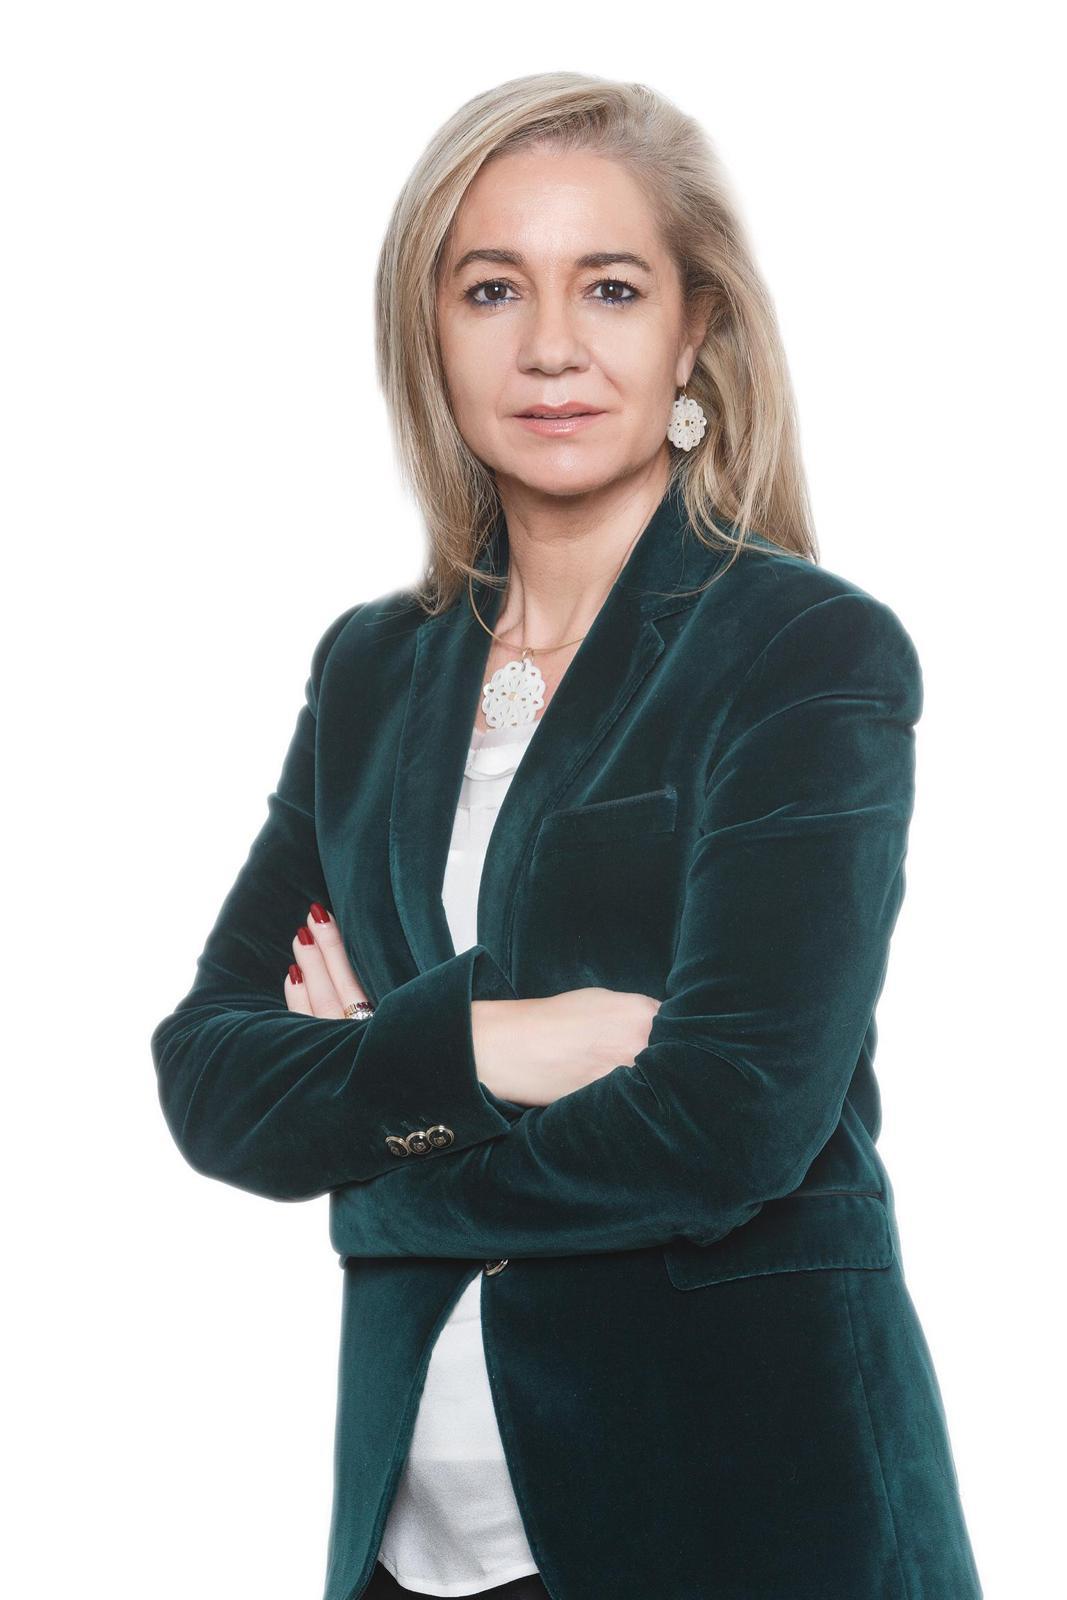 Directora médica de la clínica de odontología láser Benavente Odontic by Dra. María J. Pérez.